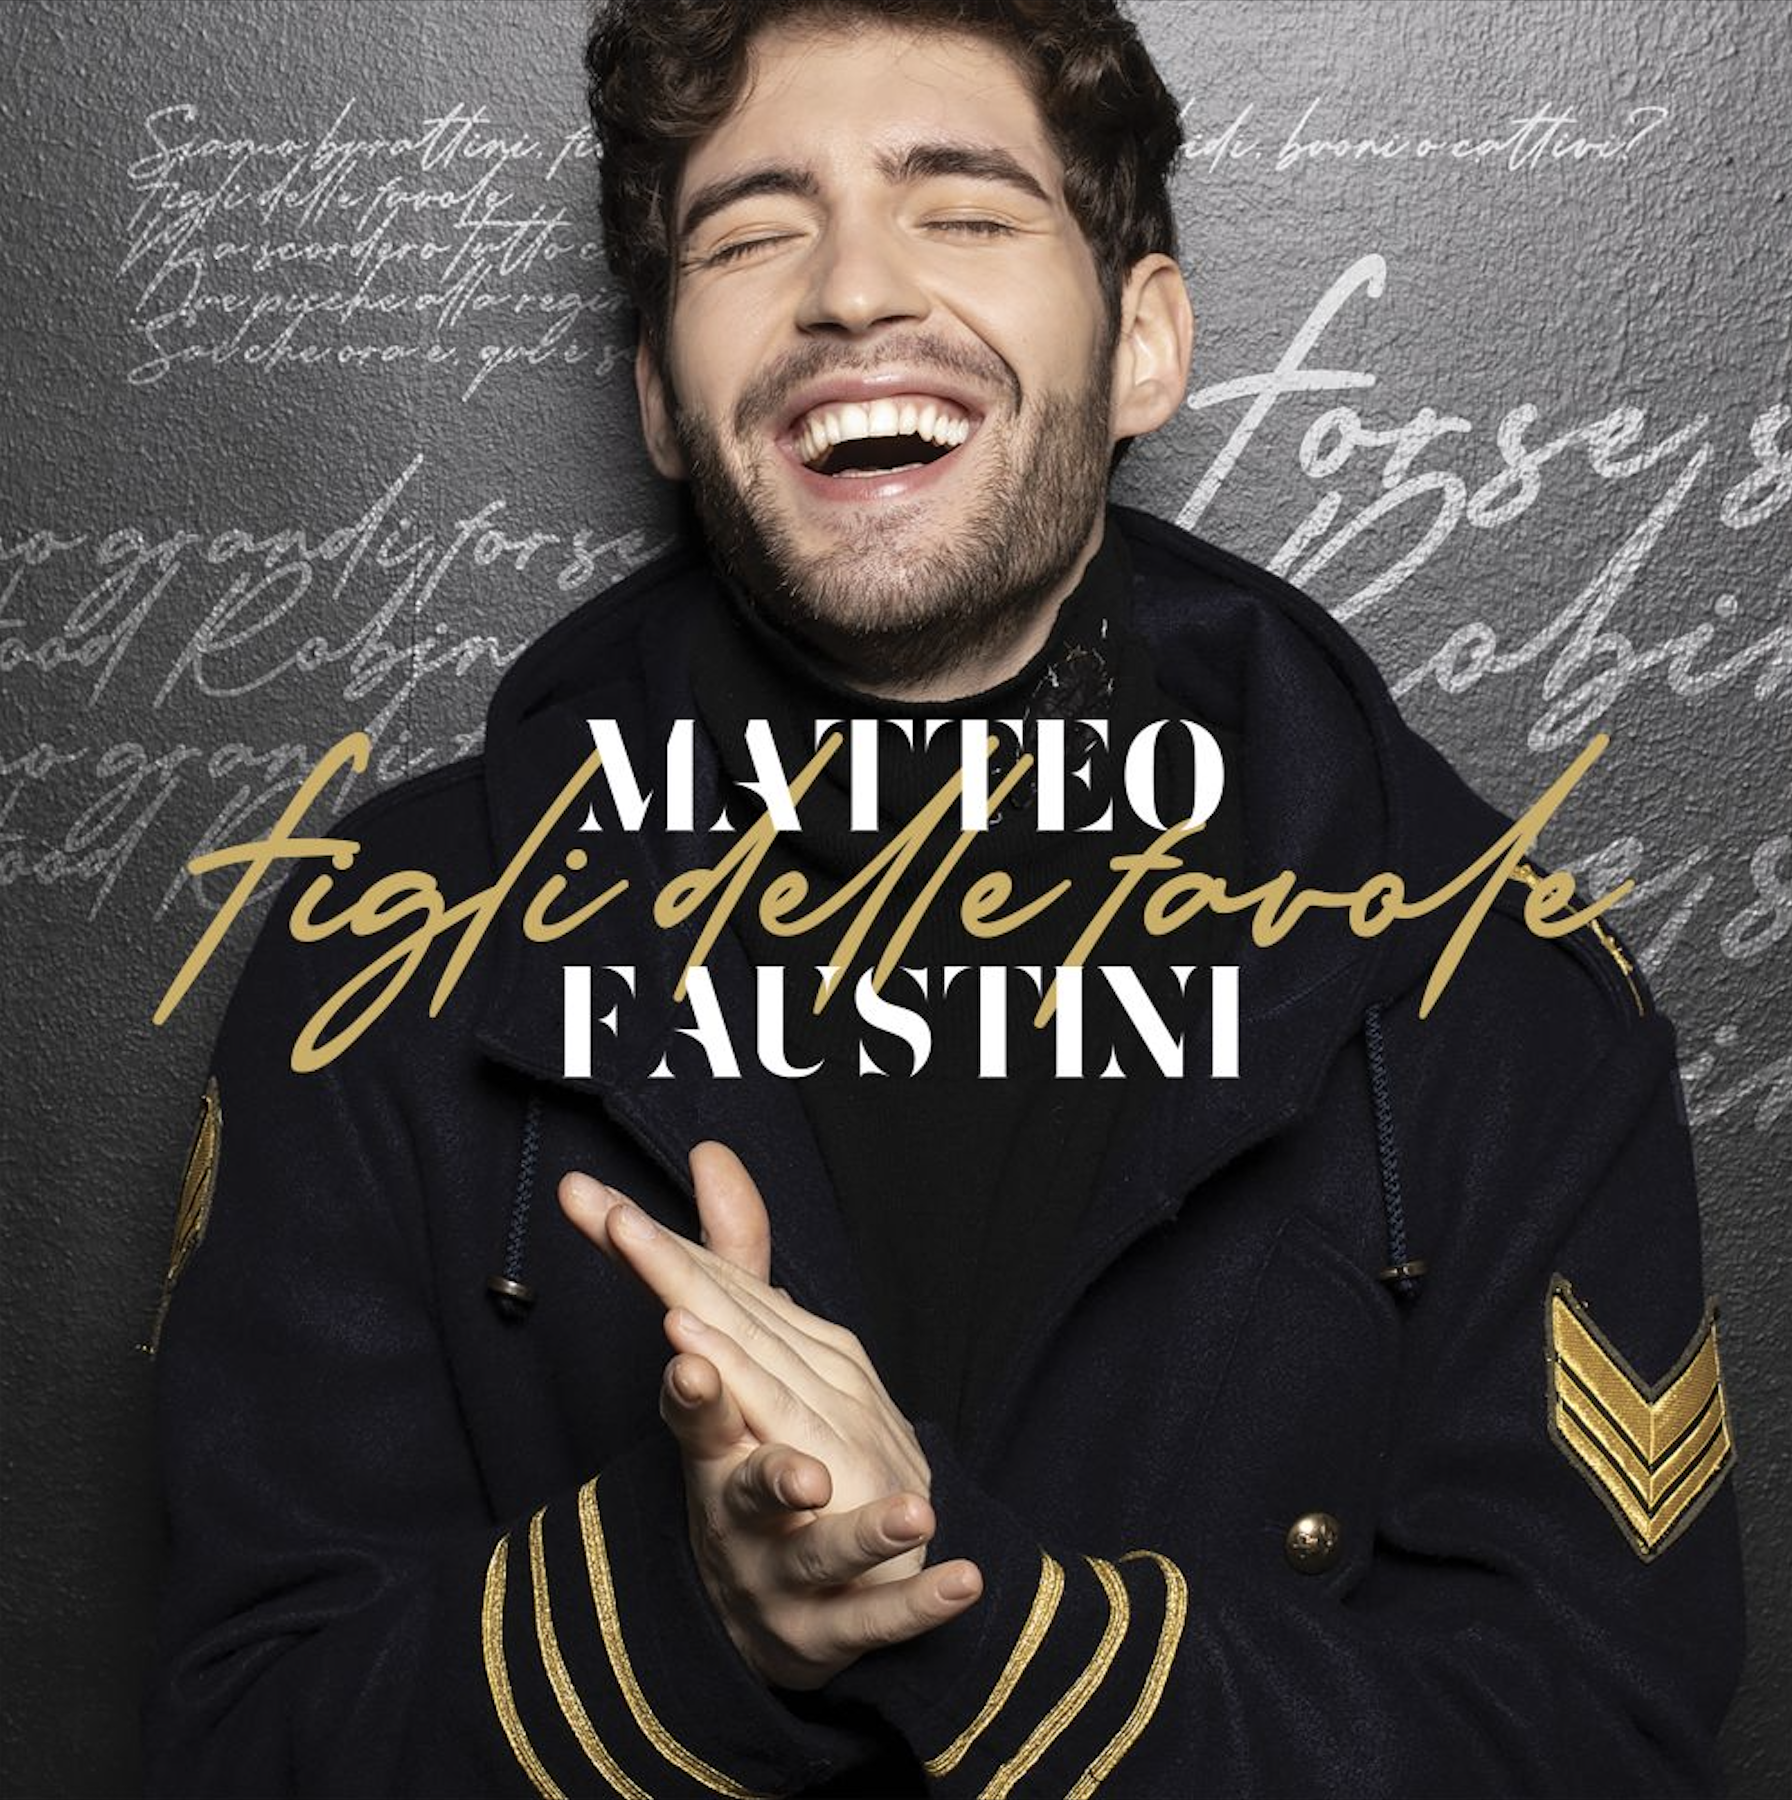 Matteo Faustini - album cover